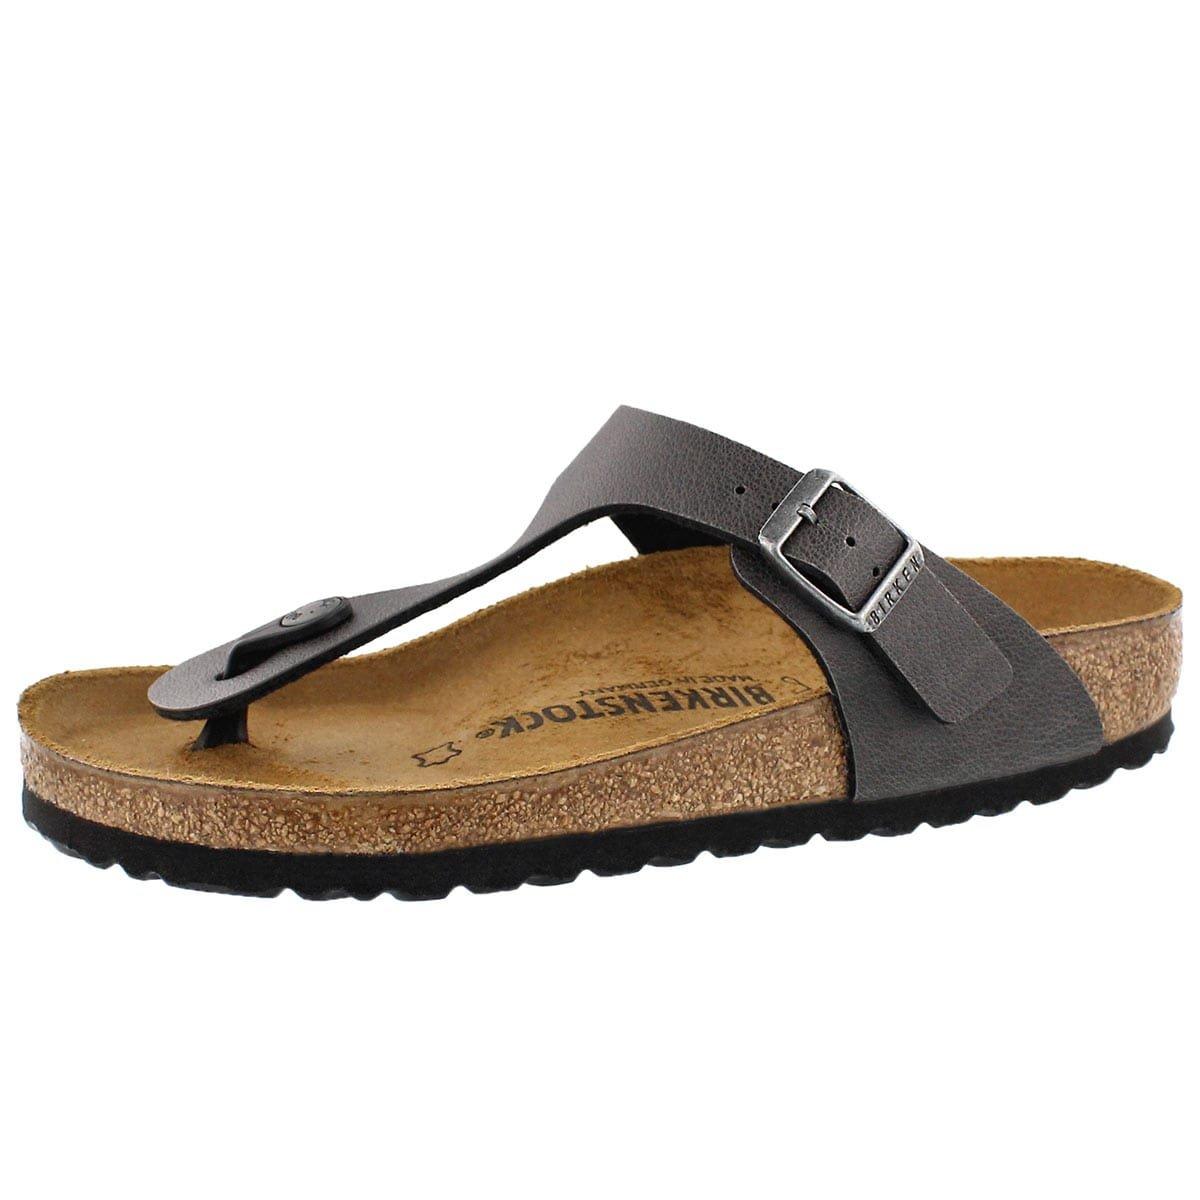 Birkenstock Women's Gizeh Cork Footbed Thong Sandal Anthracite 35 M EU